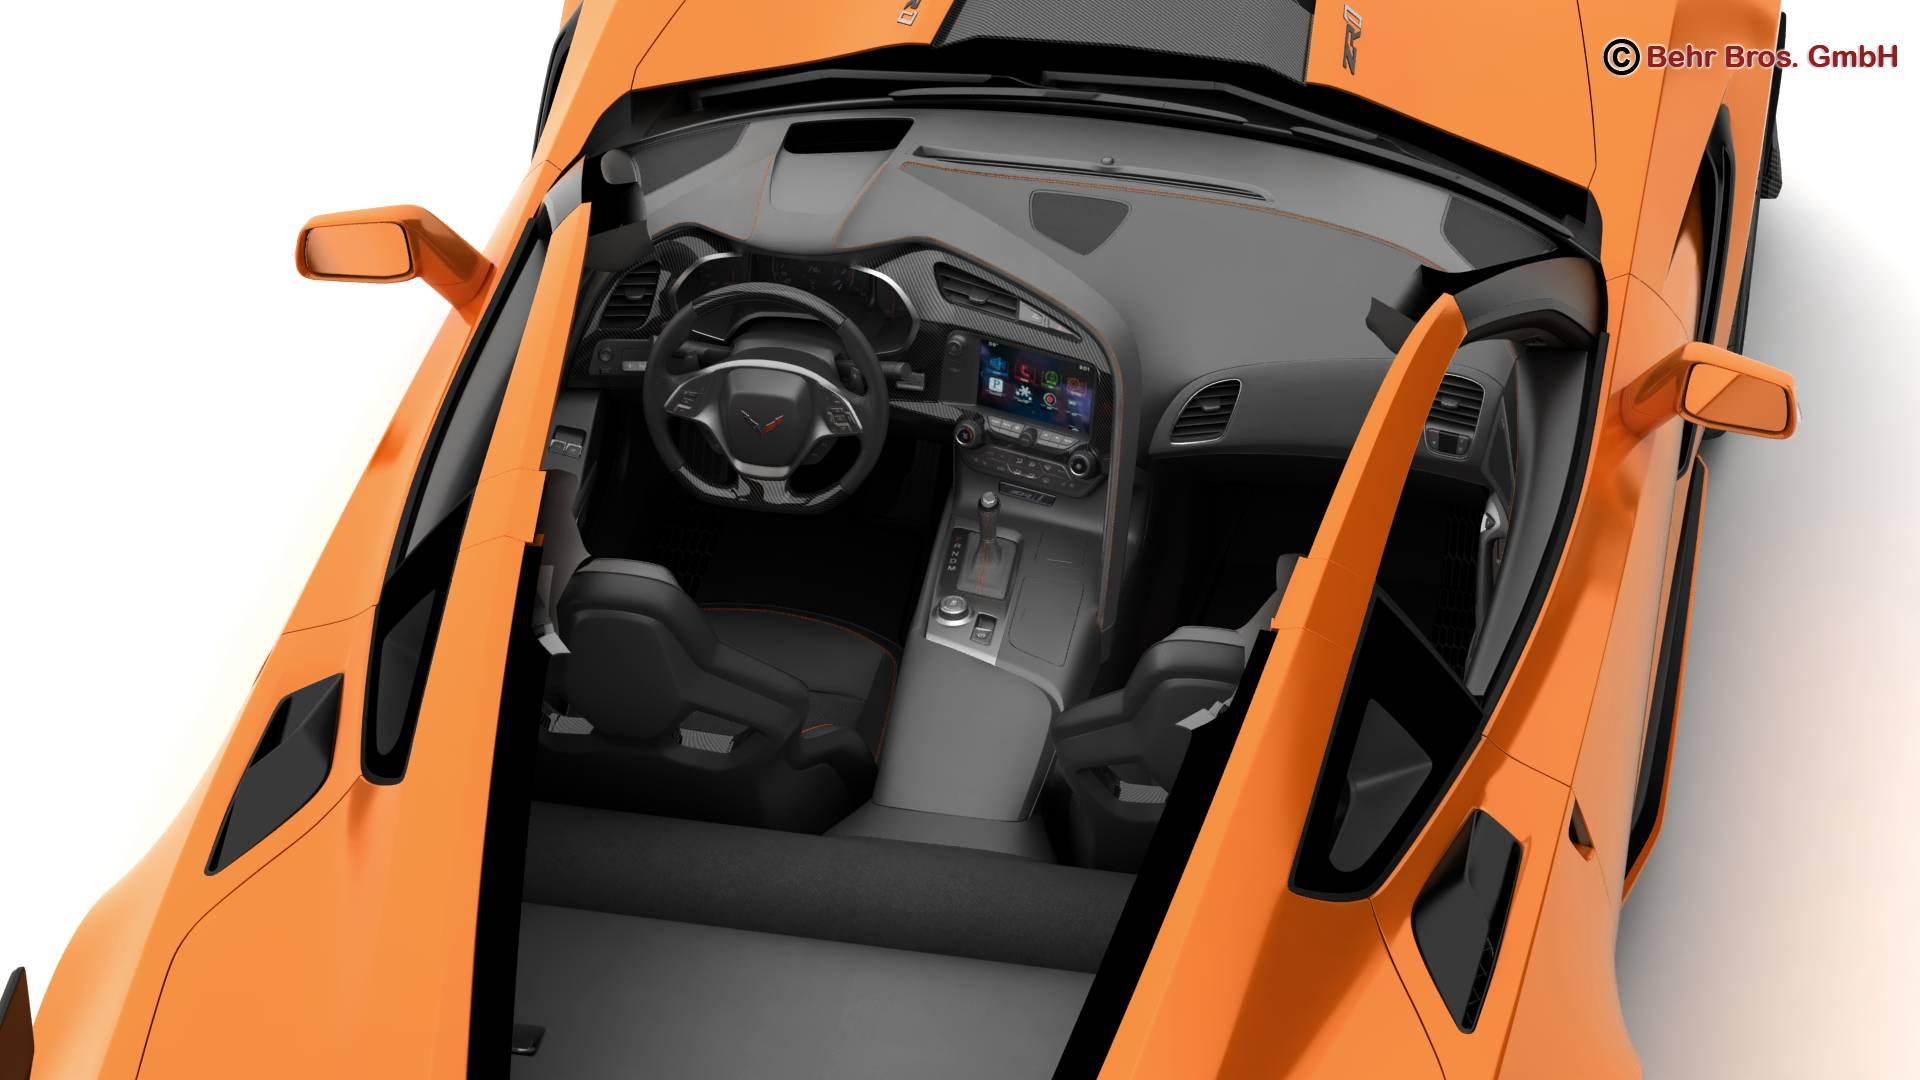 chevrolet corvette zr1 2019 3d model 3ds max fbx c4d lwo ma mb obj 275978